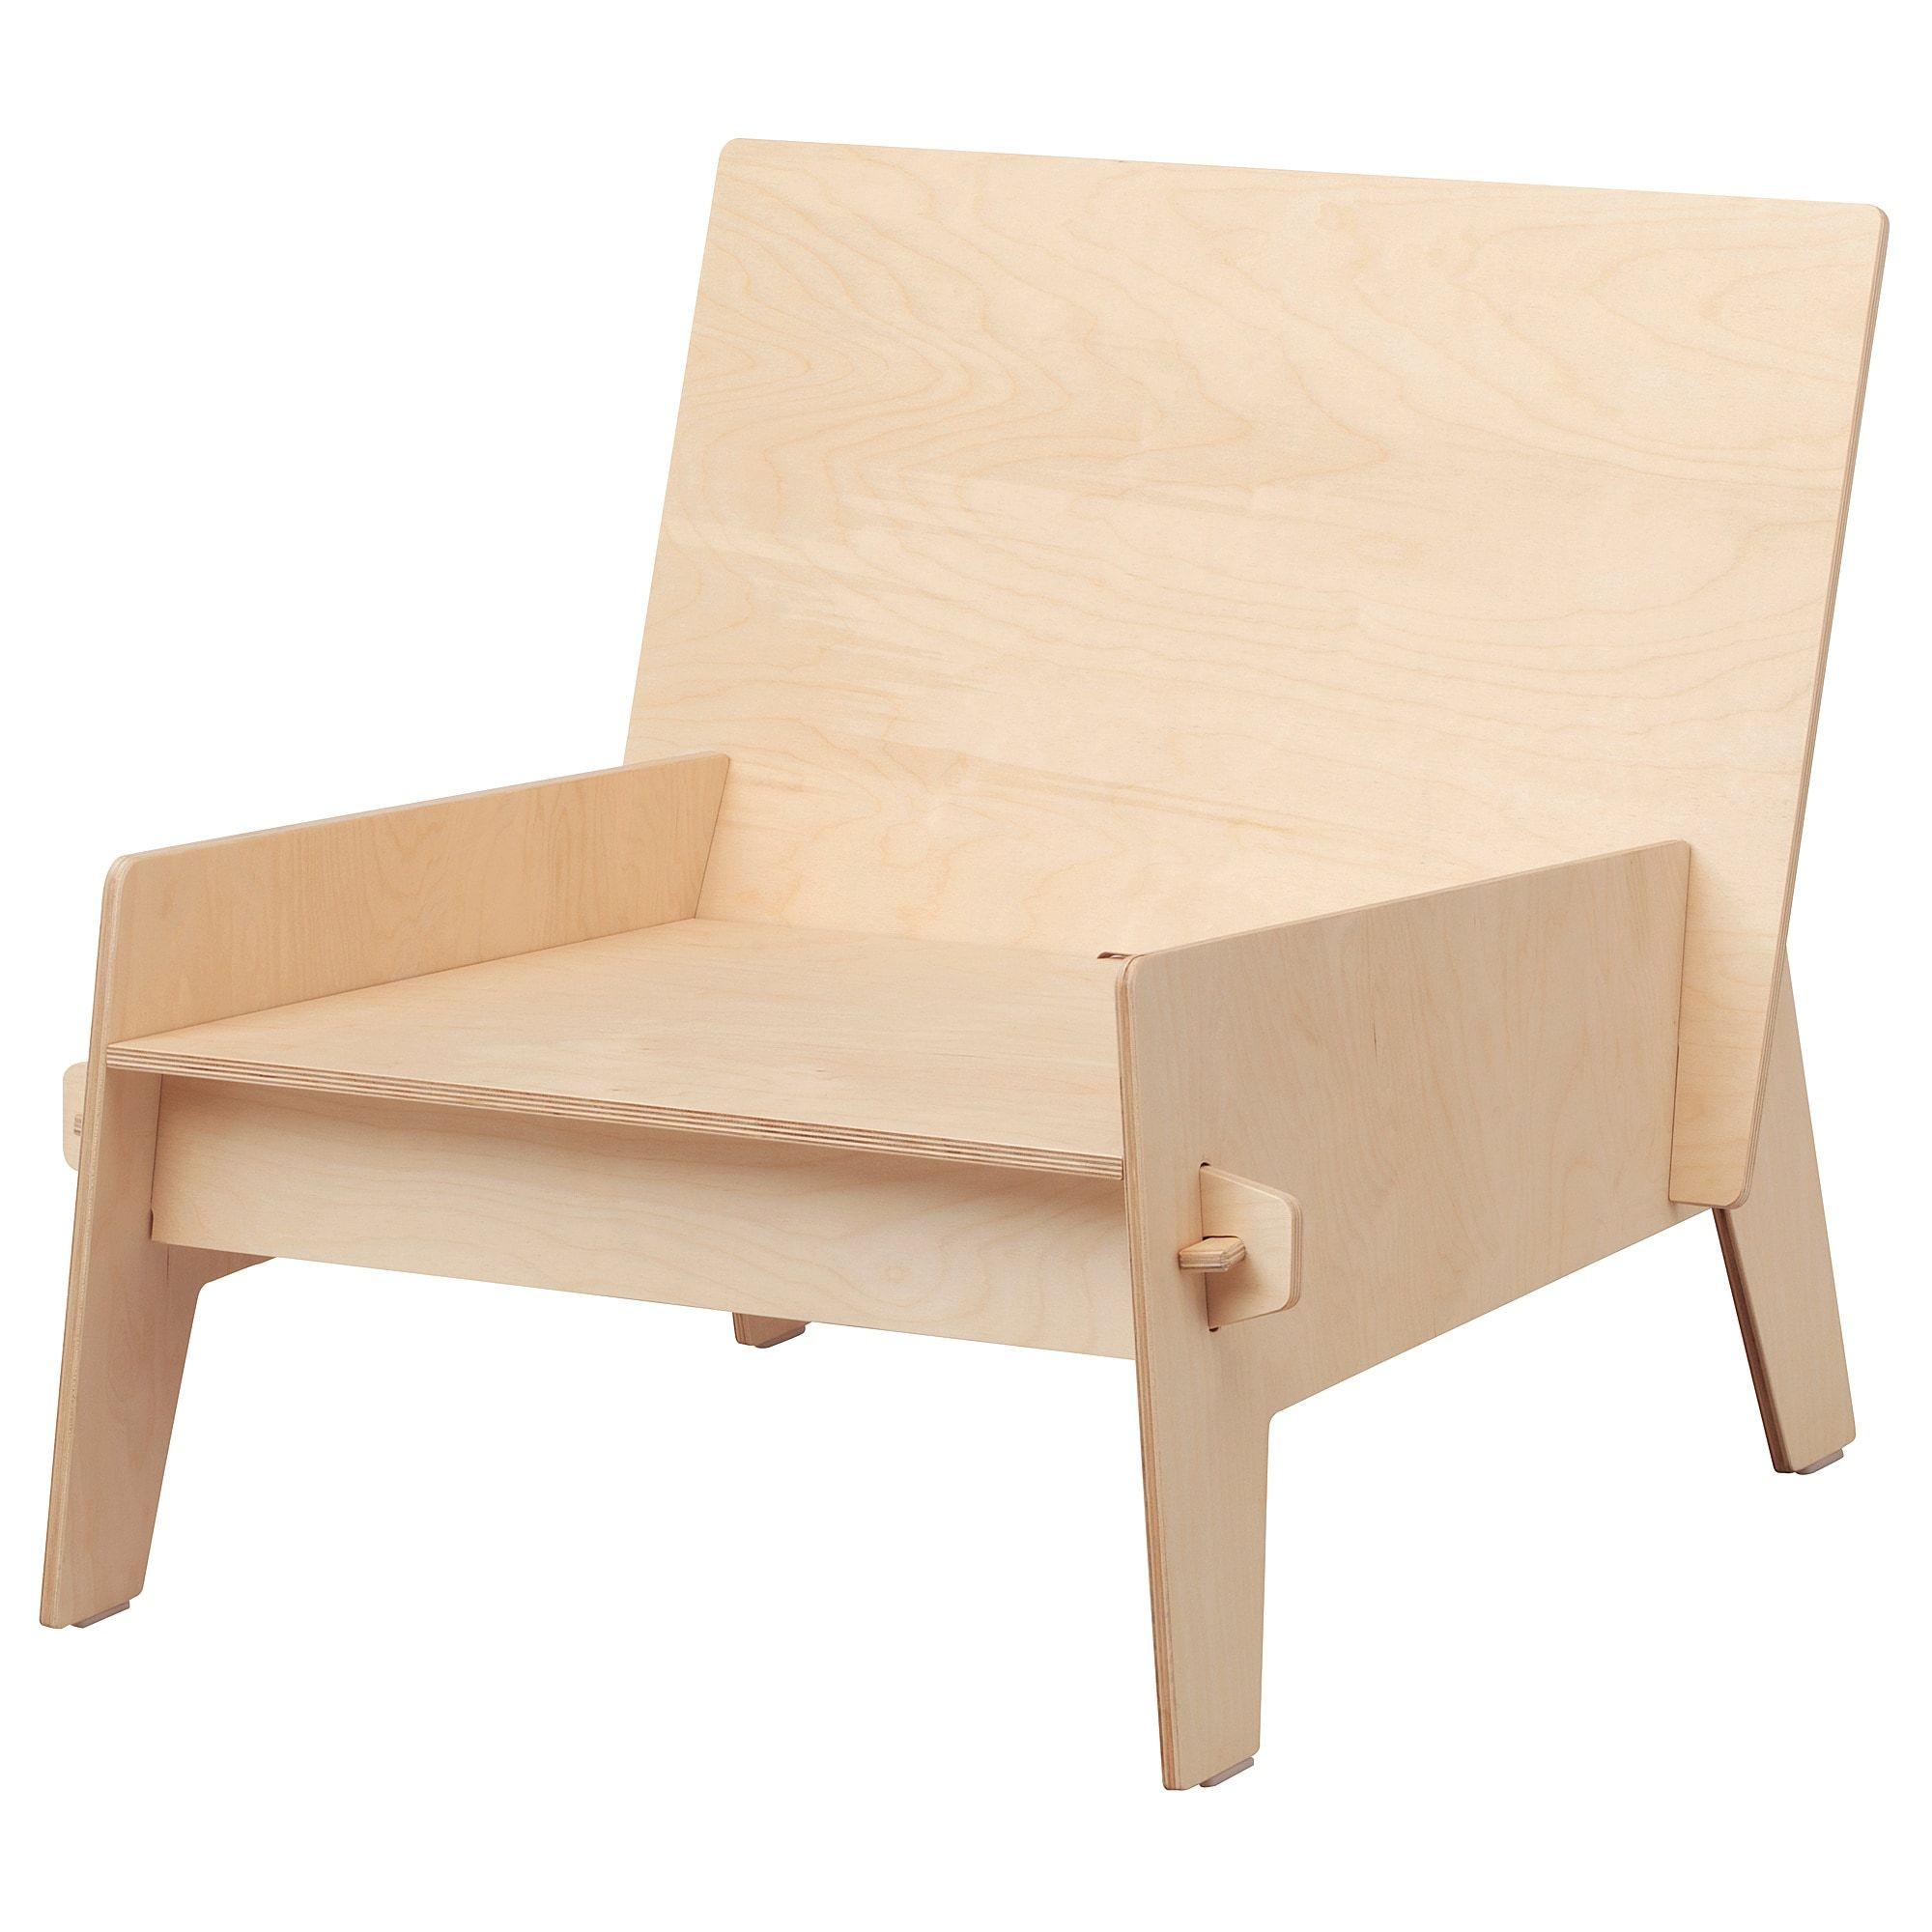 överallt Chair Plywood Home In 2019 Ikea Ikea Chair